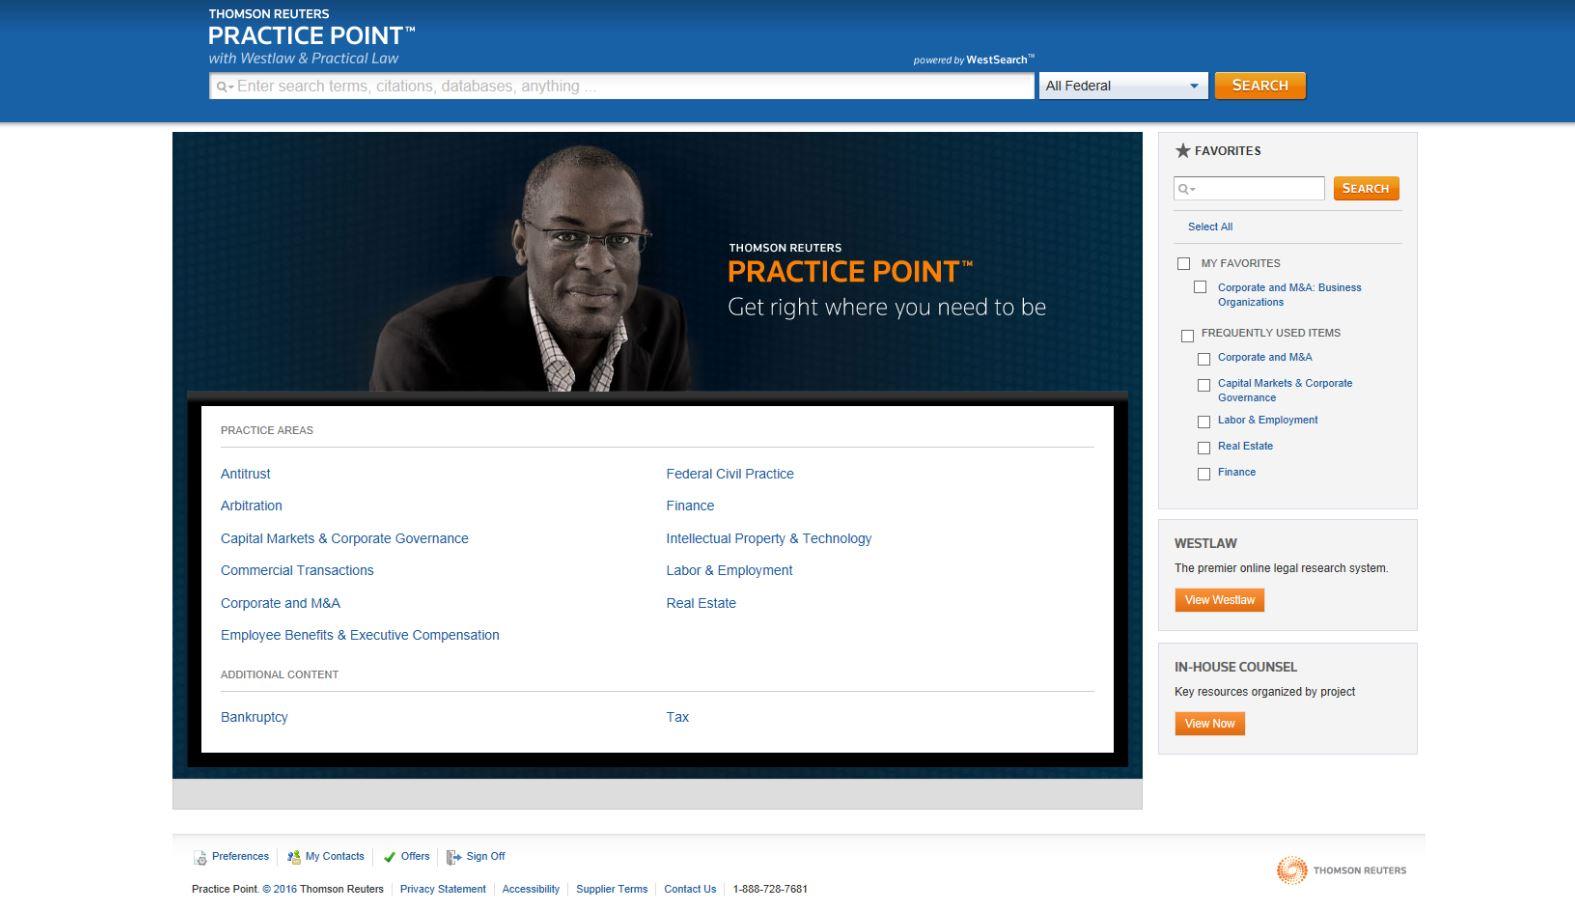 Practice Point: Thomson Reuters Promises